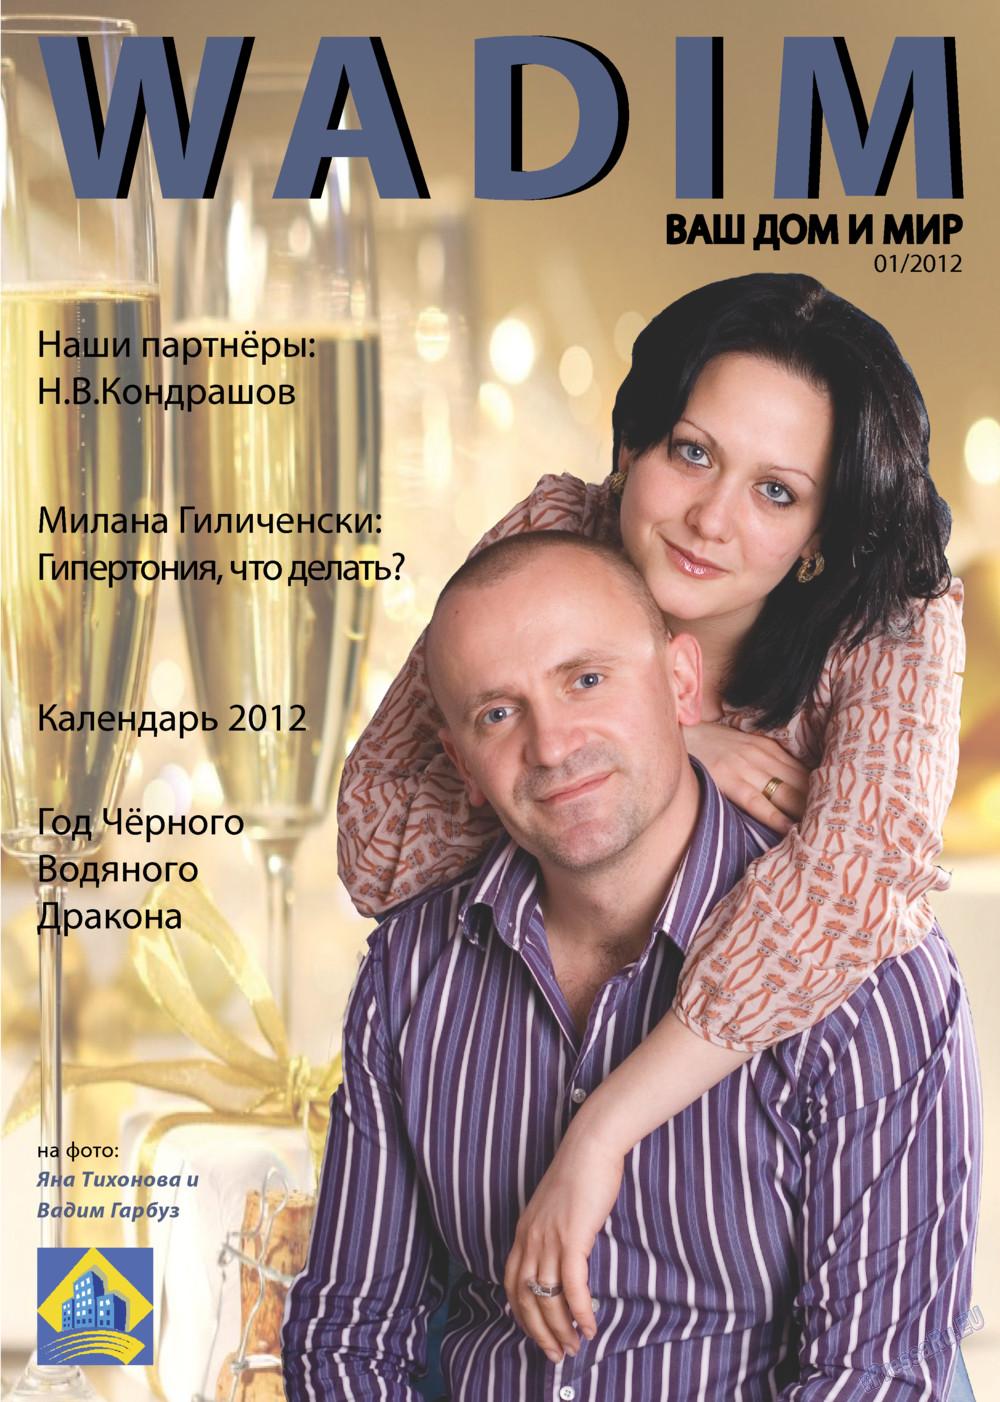 Wadim (журнал). 2012 год, номер 1, стр. 1